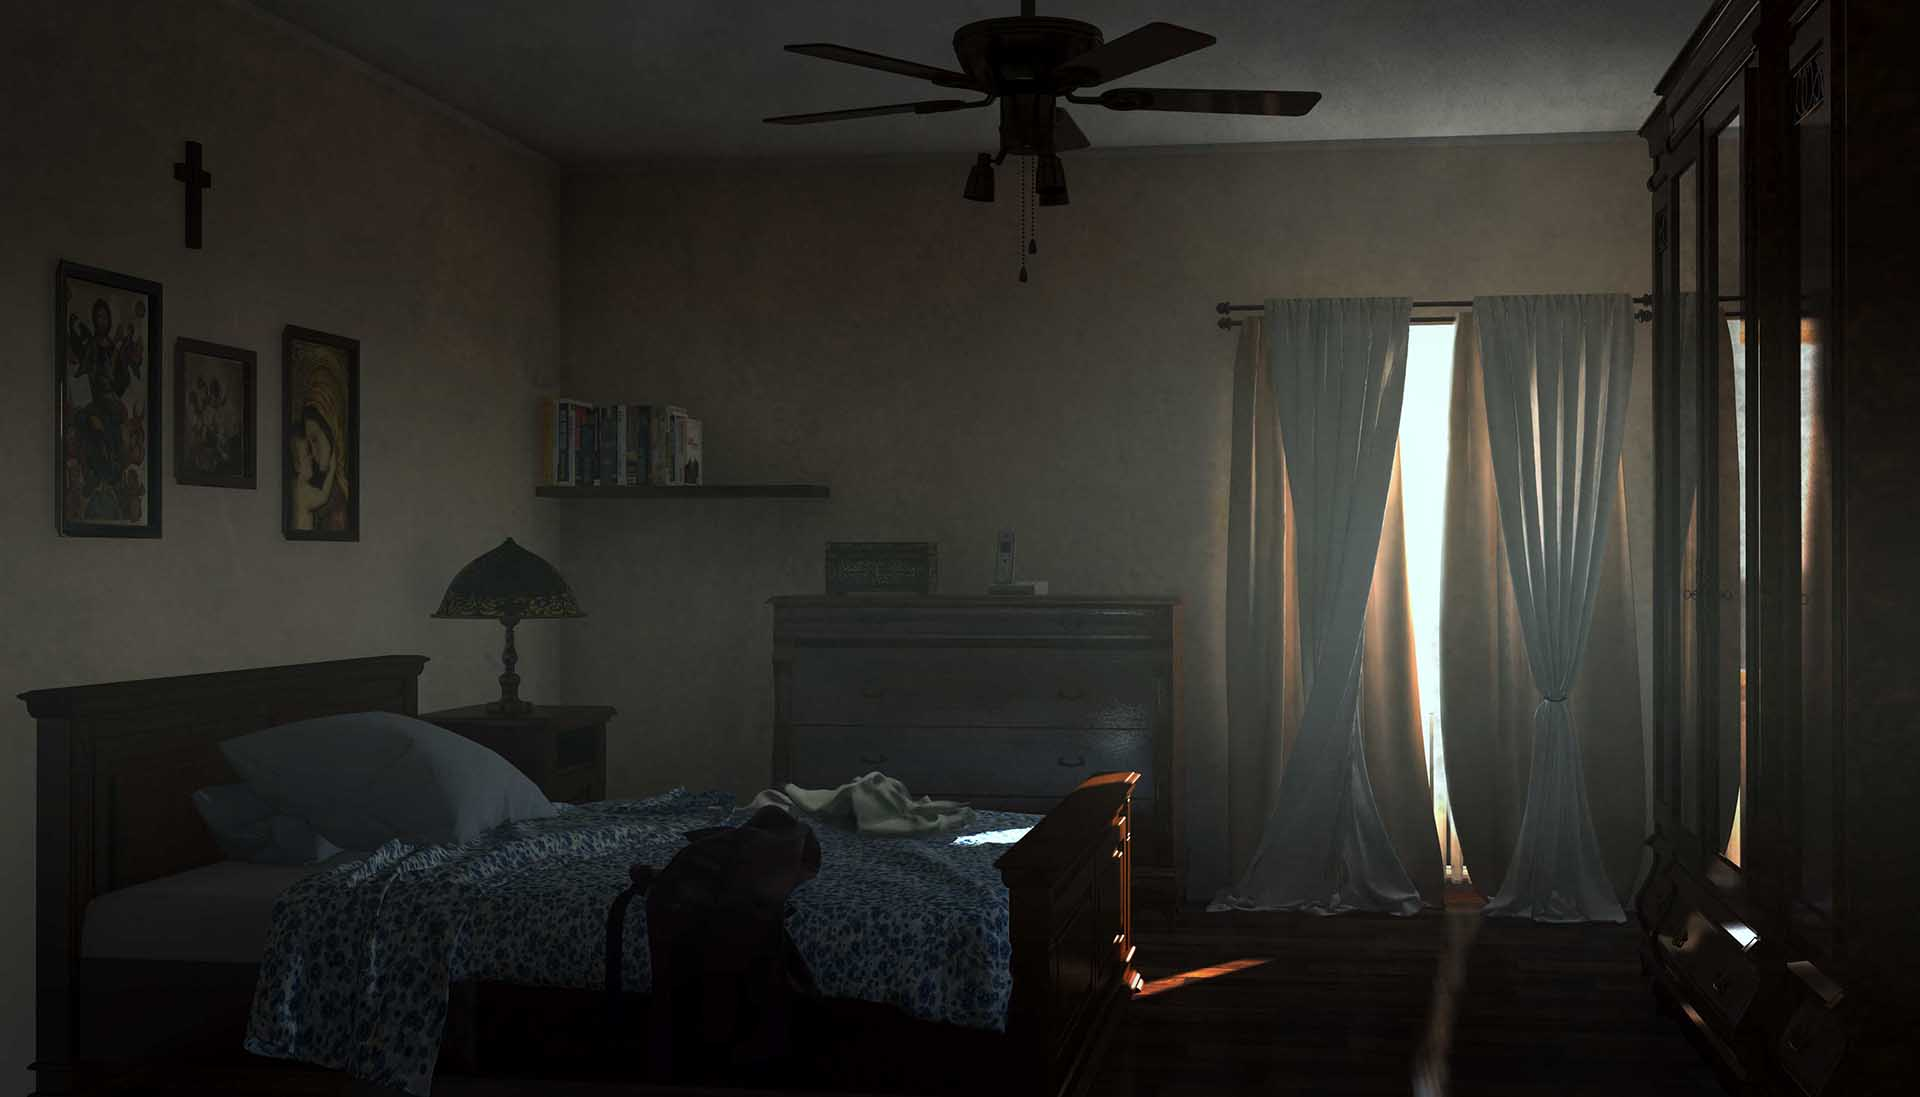 alice-manieri-set-visual-design-storytelling-art-concept-abbraccialo-per-me-sindoni-render-modellazi